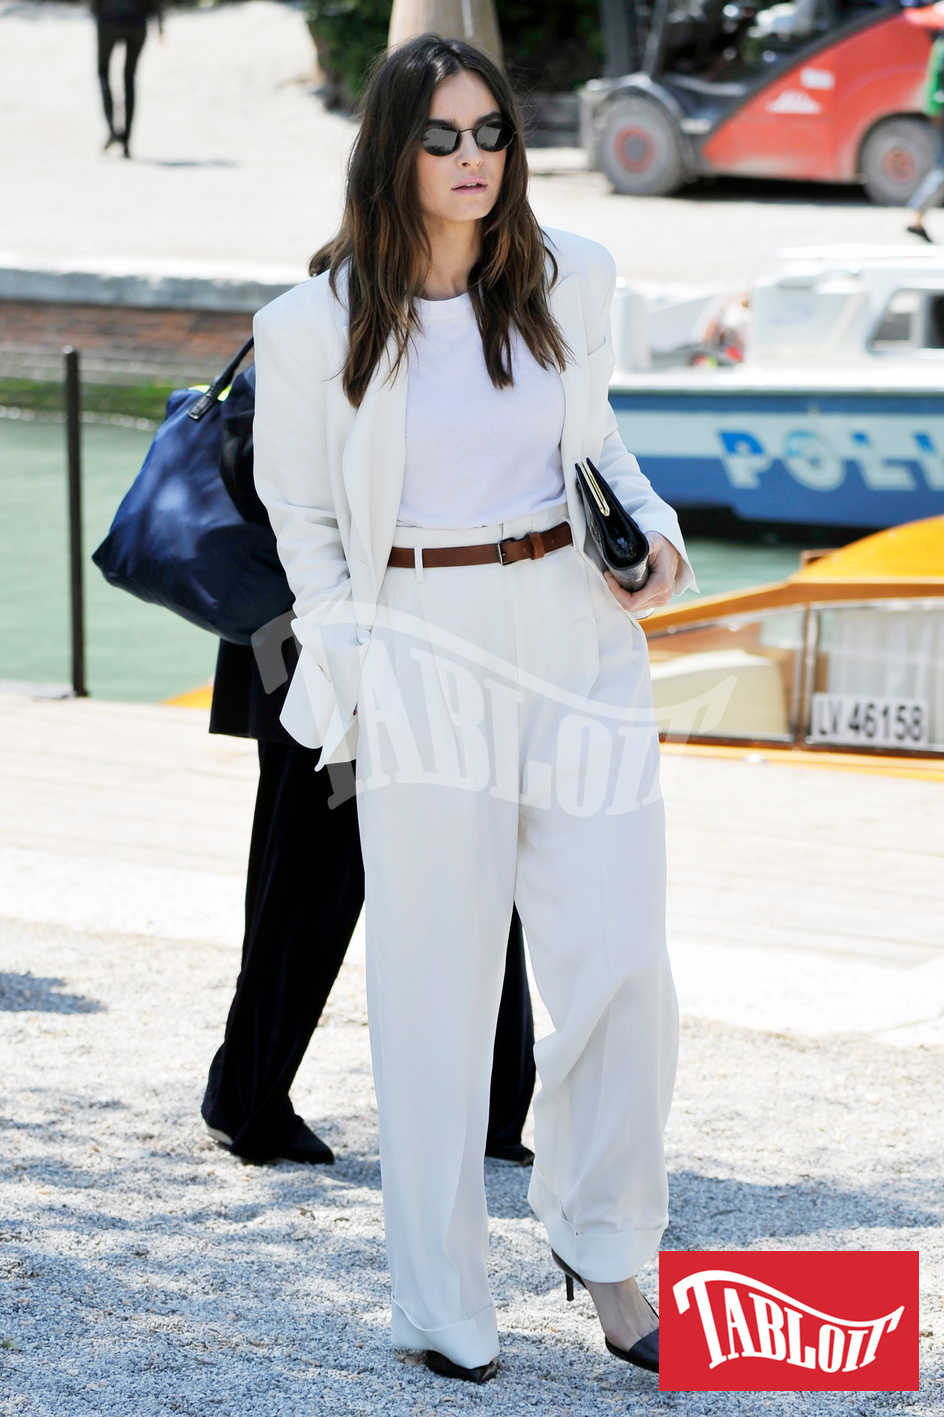 Kasia Smutniak, elegante in completo total white a venezia